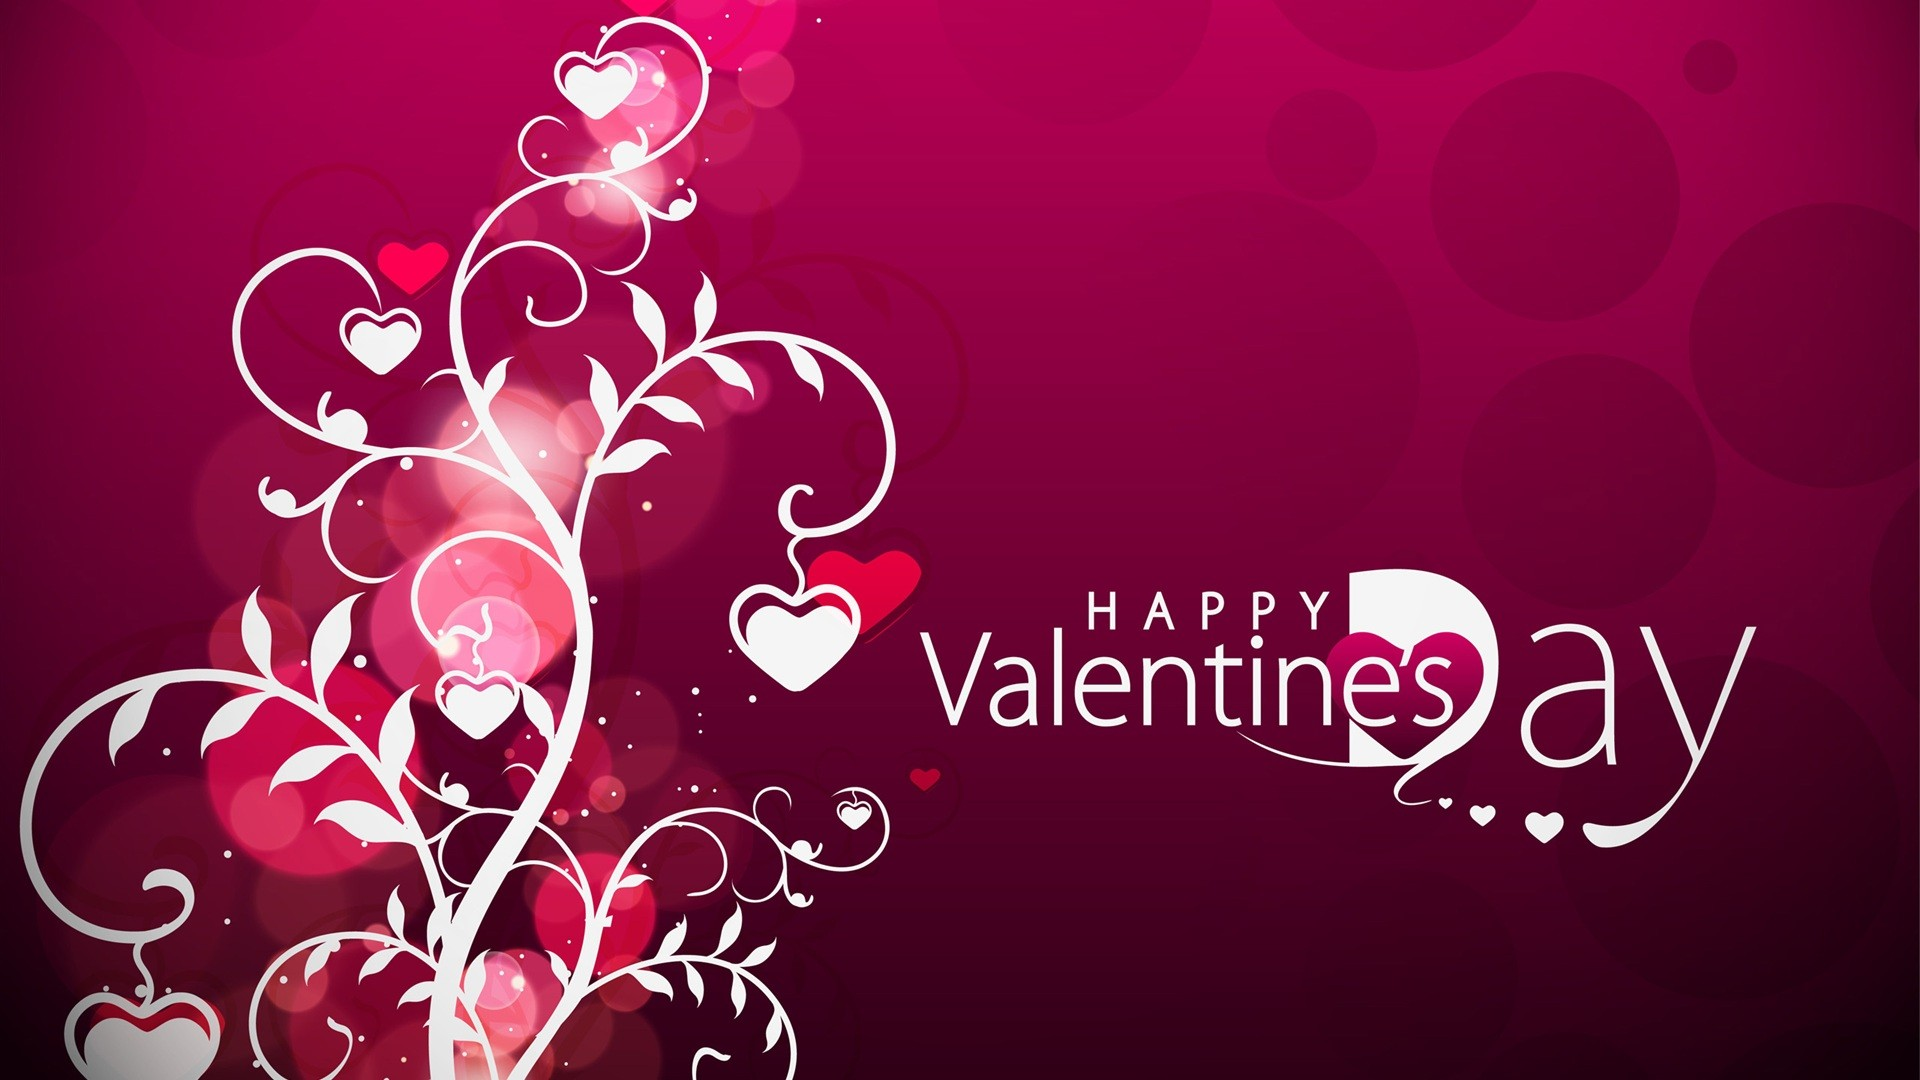 Happy Valentines Day 2016 Images   Happy Birthday Cake Images 1920x1080